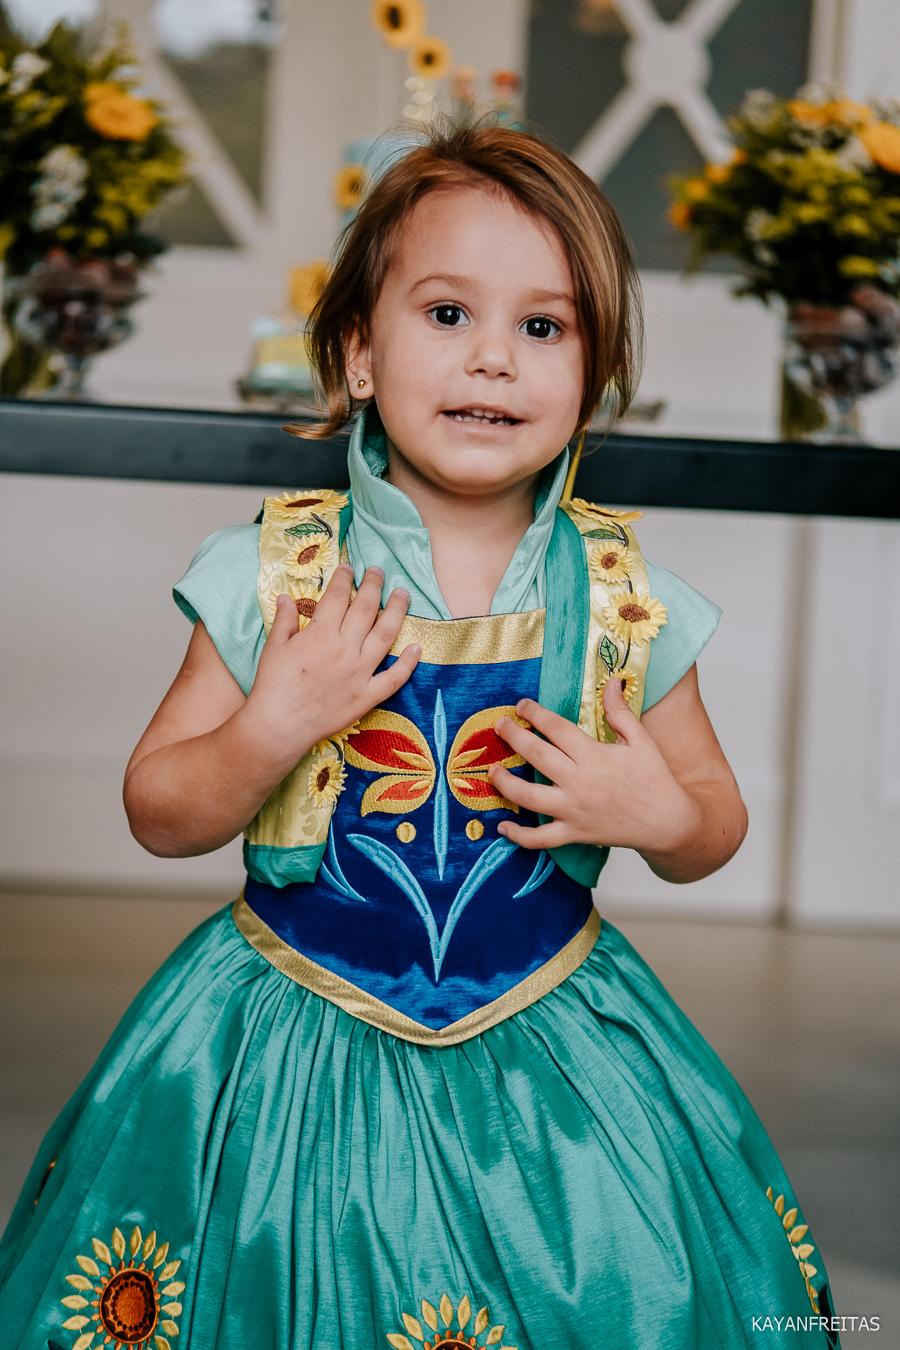 anita-3anos-0011 Aniversário de 3 anos Anita - Santo Amaro da Imperatriz